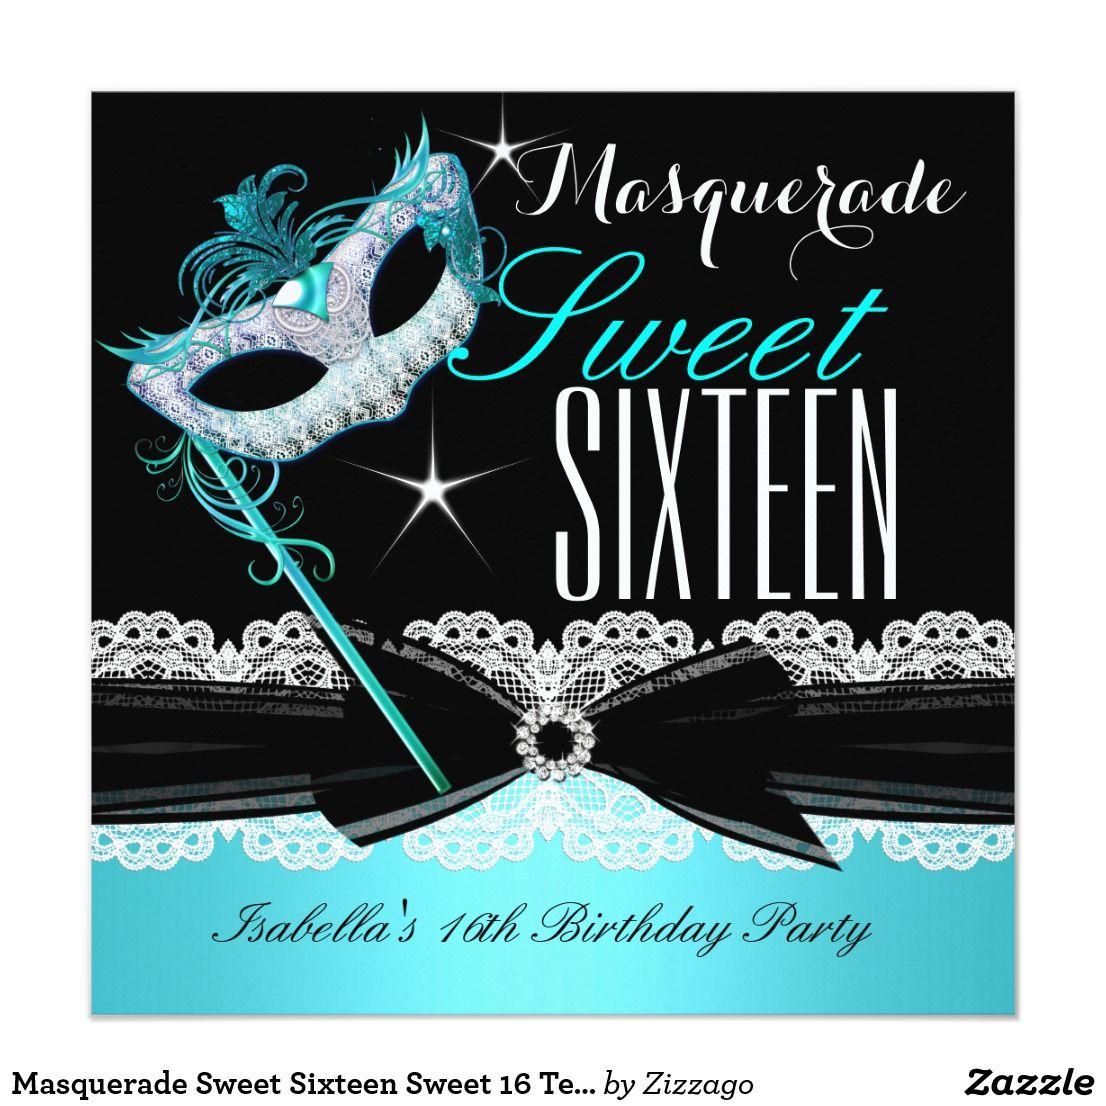 Masquerade Sweet Sixteen Sweet 16 Teal Blue 3   MASQUERADE SWEET ...